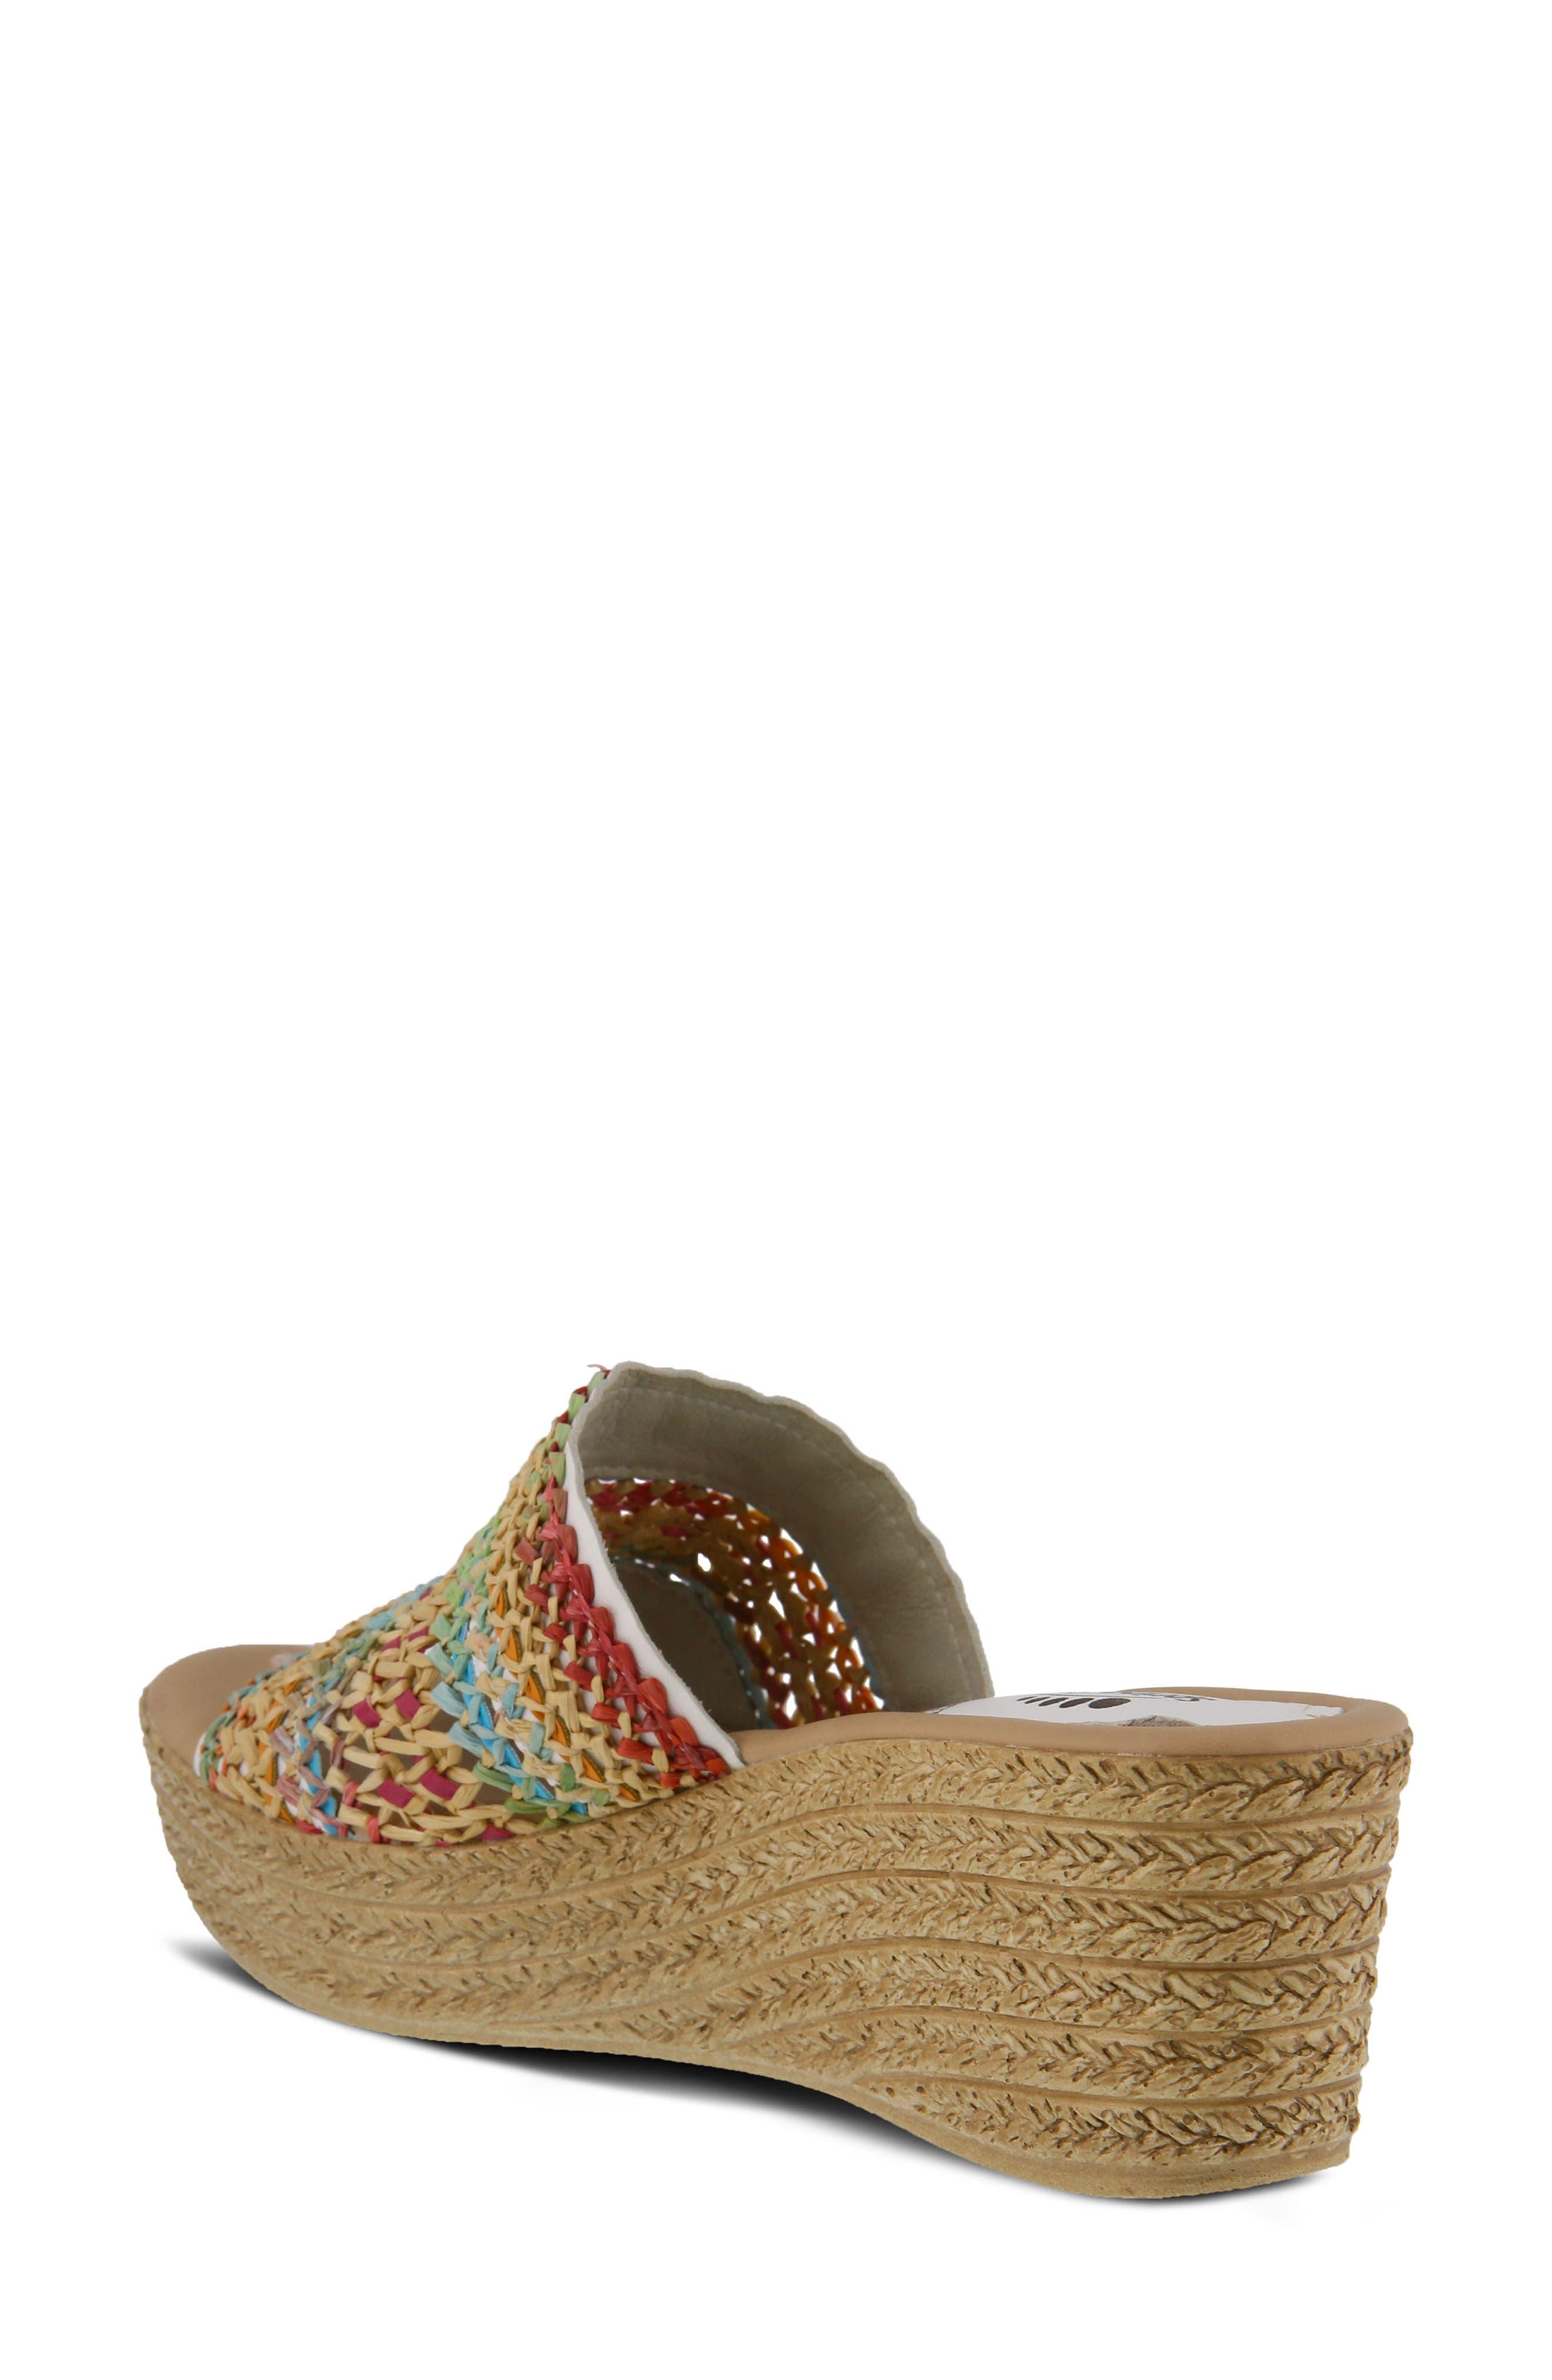 Calci Espadrille Wedge Sandal,                             Alternate thumbnail 2, color,                             White Leather